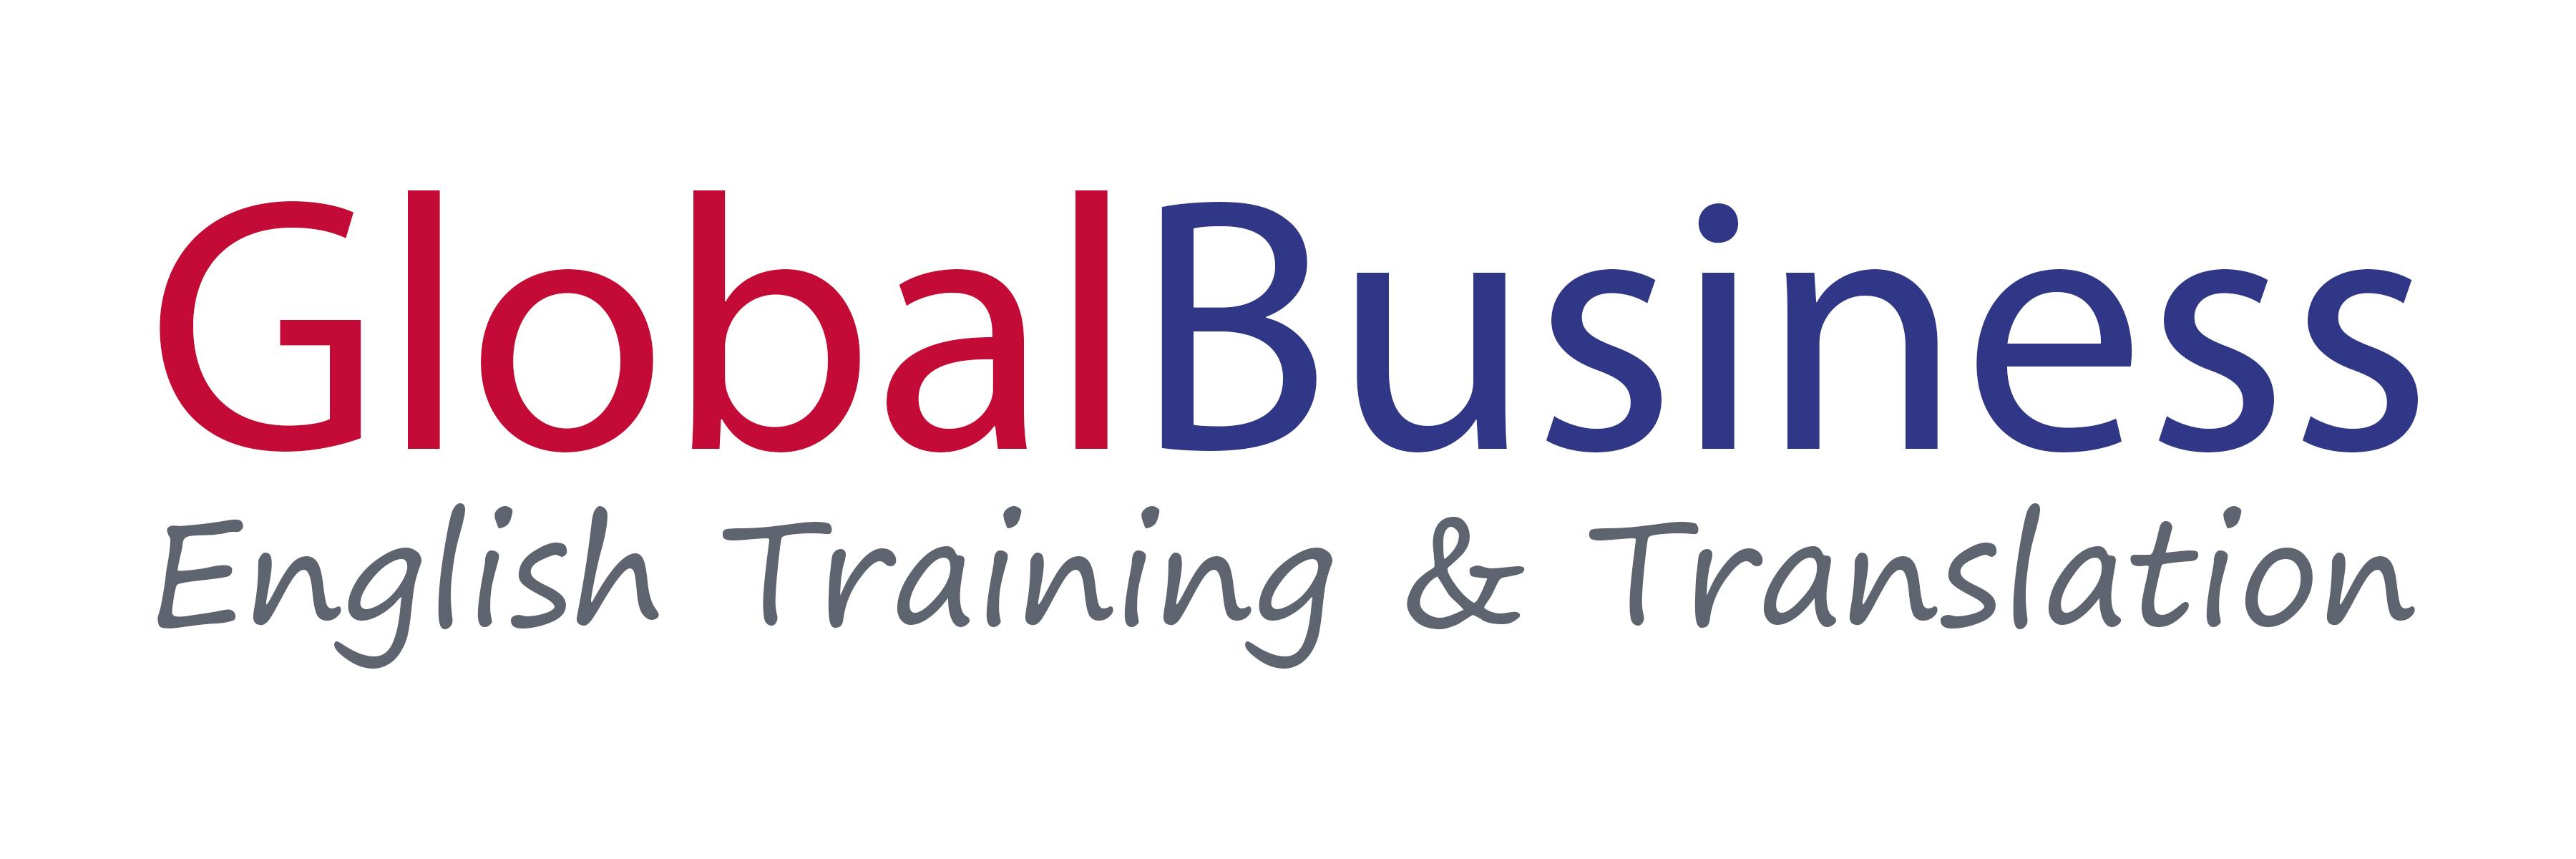 Global Business English Training & Translation